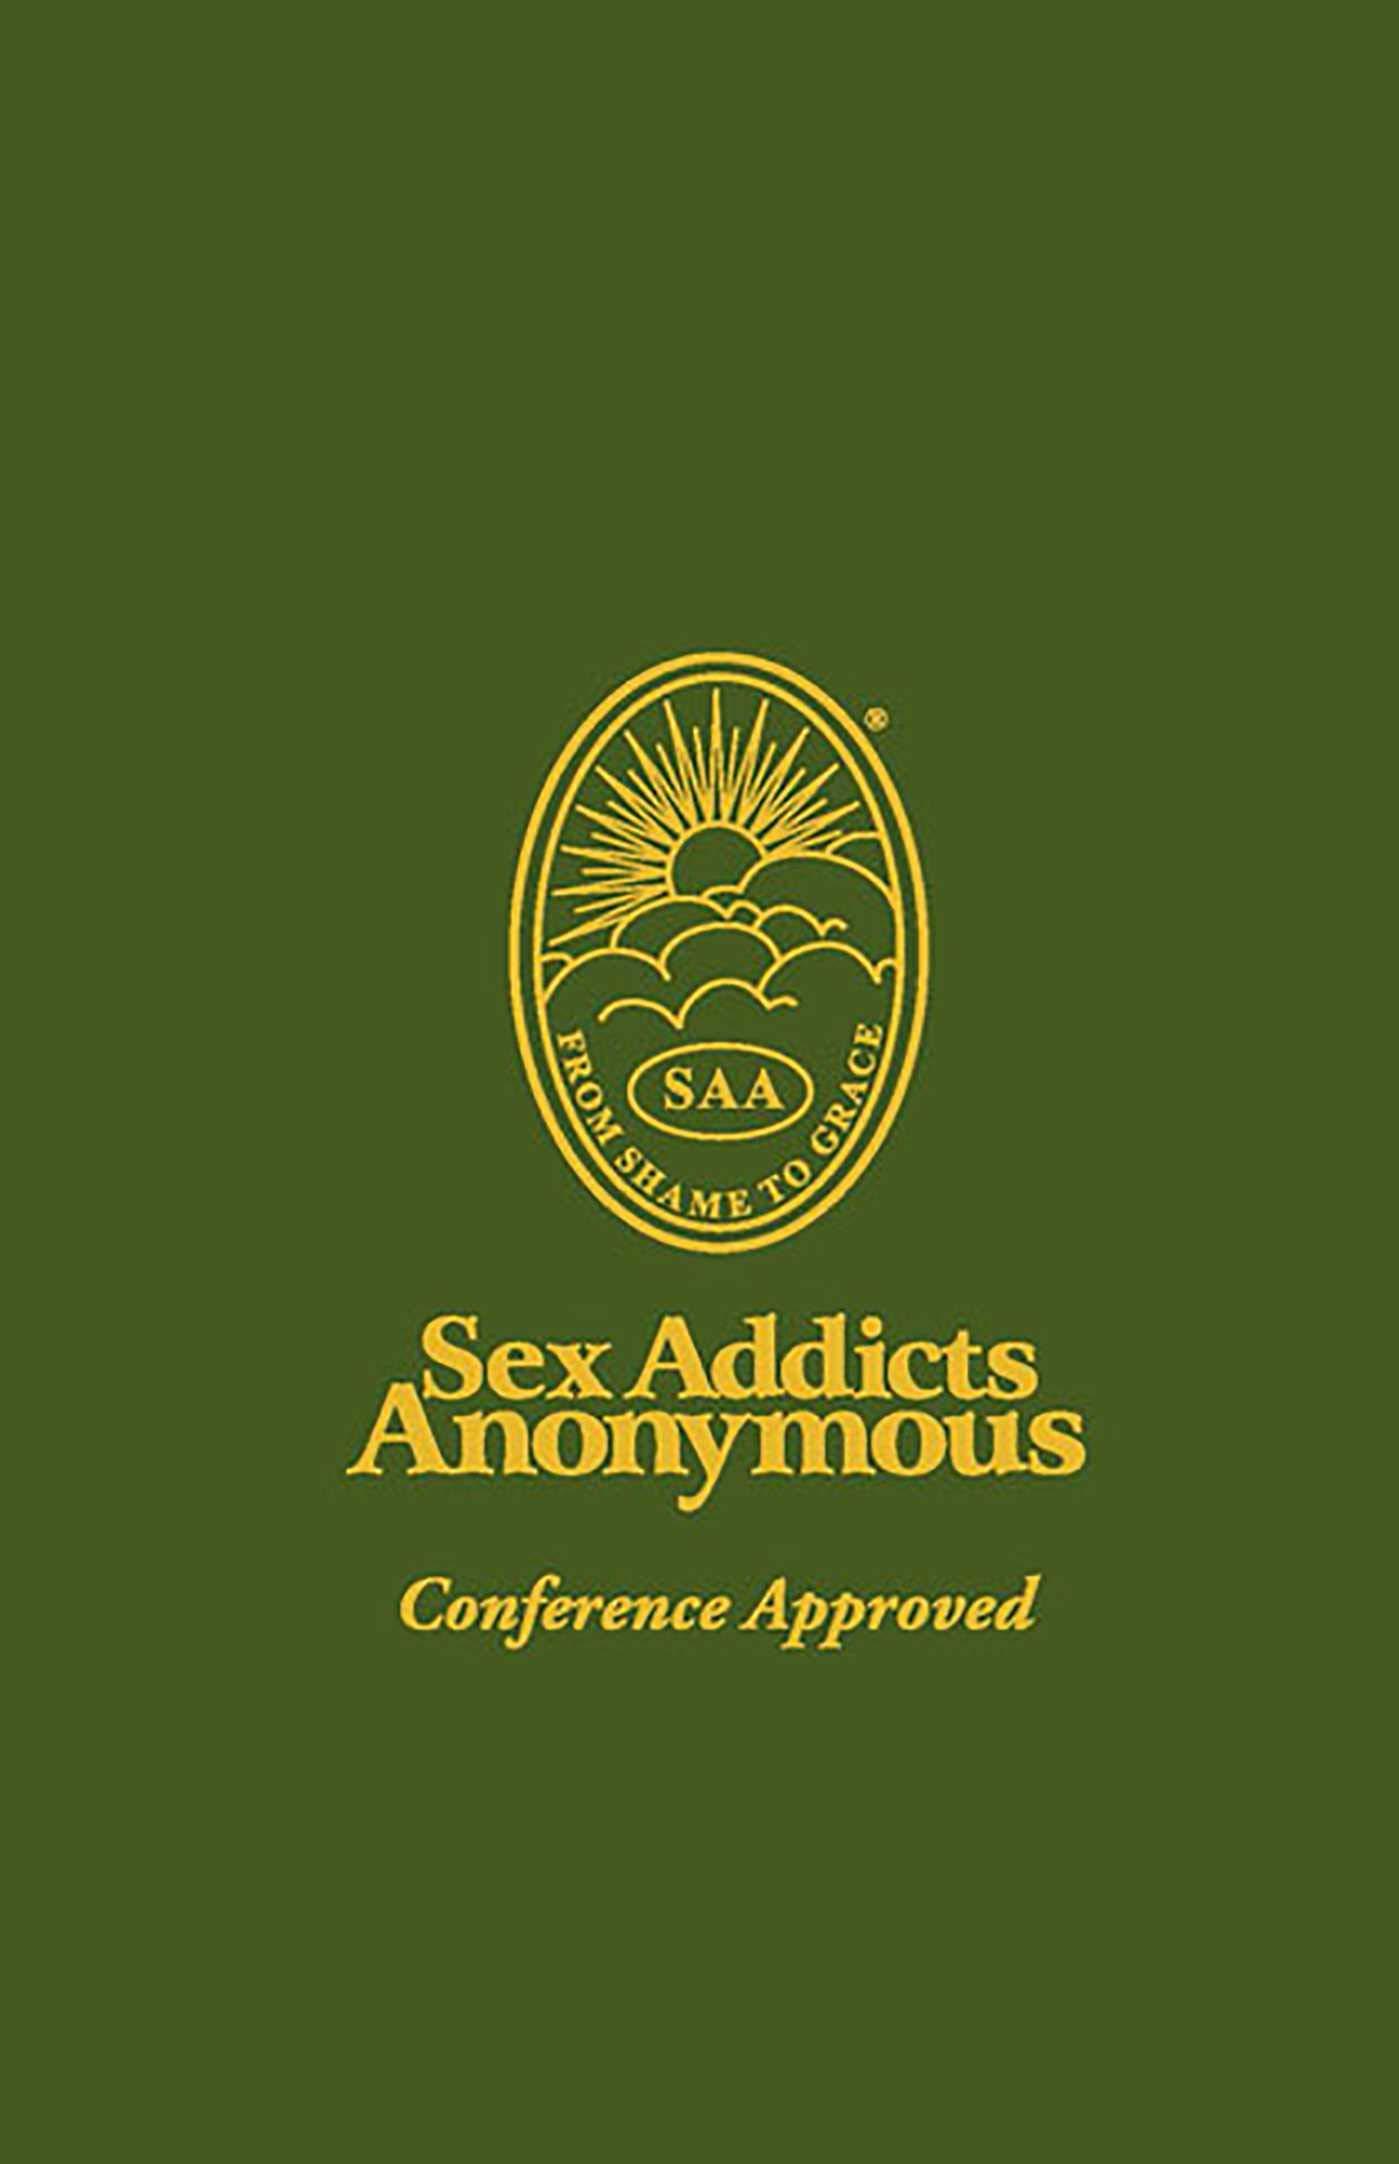 Sex addicts annoymous